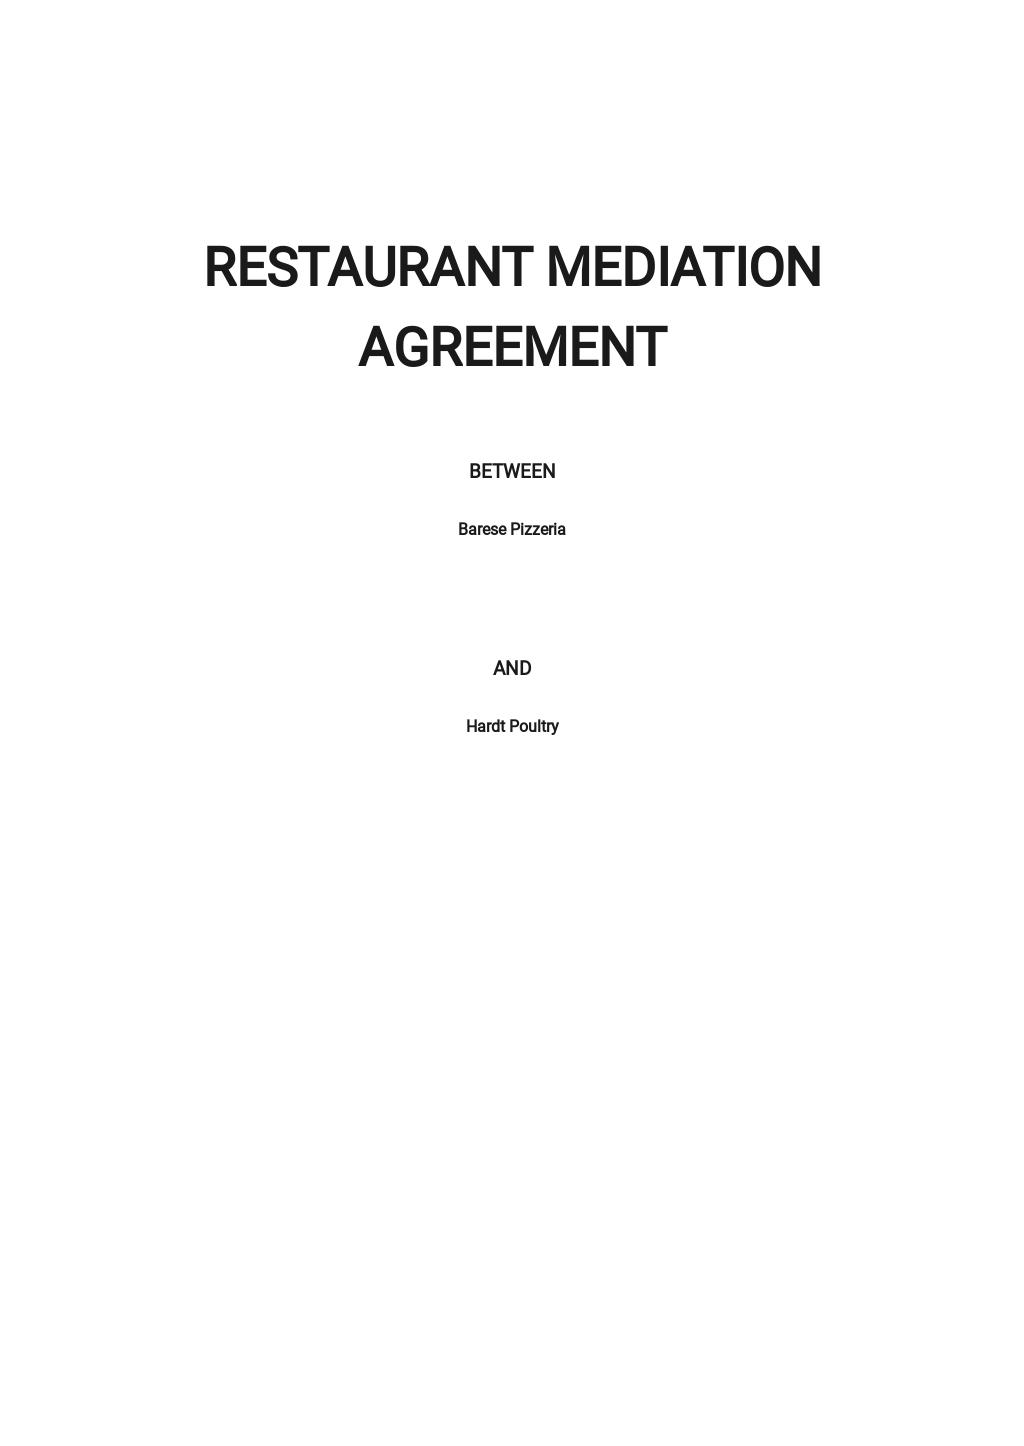 Restaurant Mediation Agreement Template